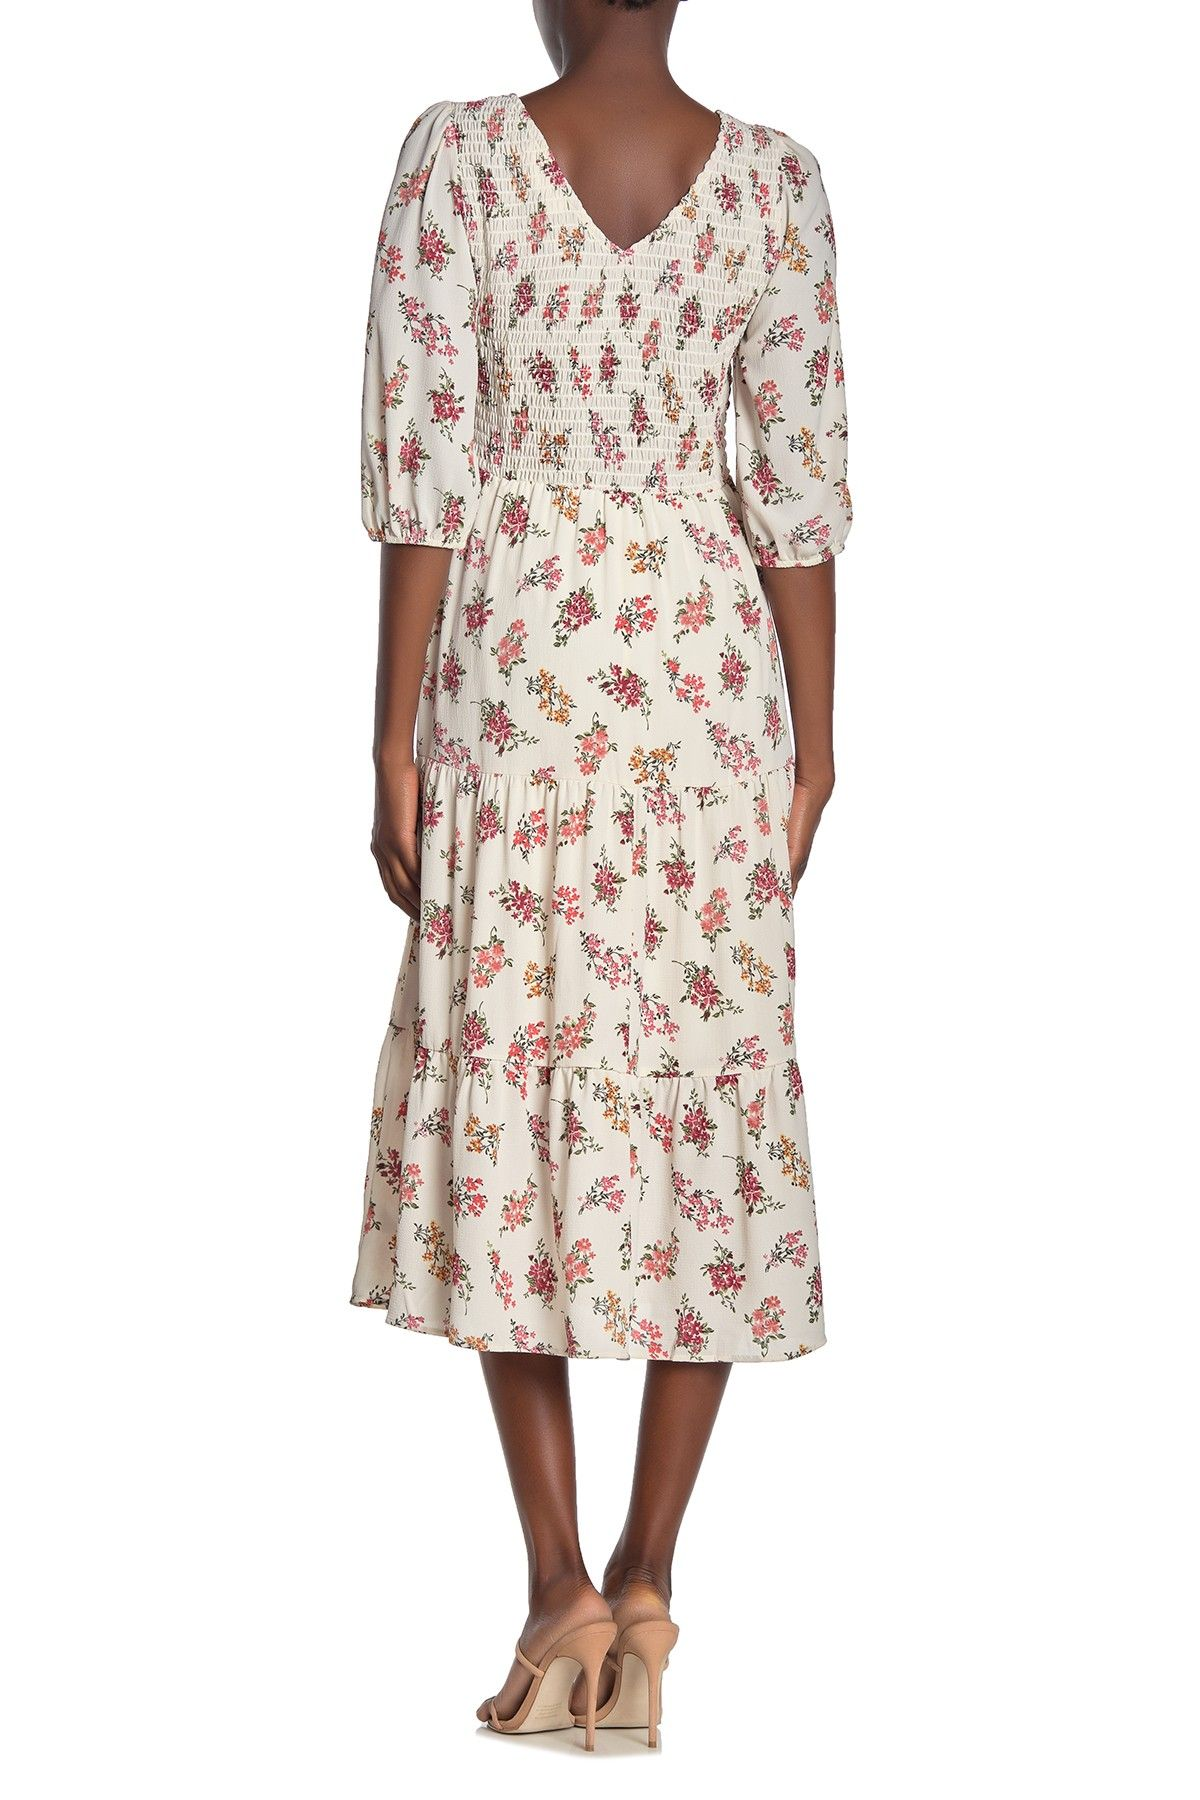 Superfoxx Smocked Bodice 3 4 Sleeve Midi Dress Hautelook Midi Dress With Sleeves Midi Dress Dresses [ 1800 x 1200 Pixel ]